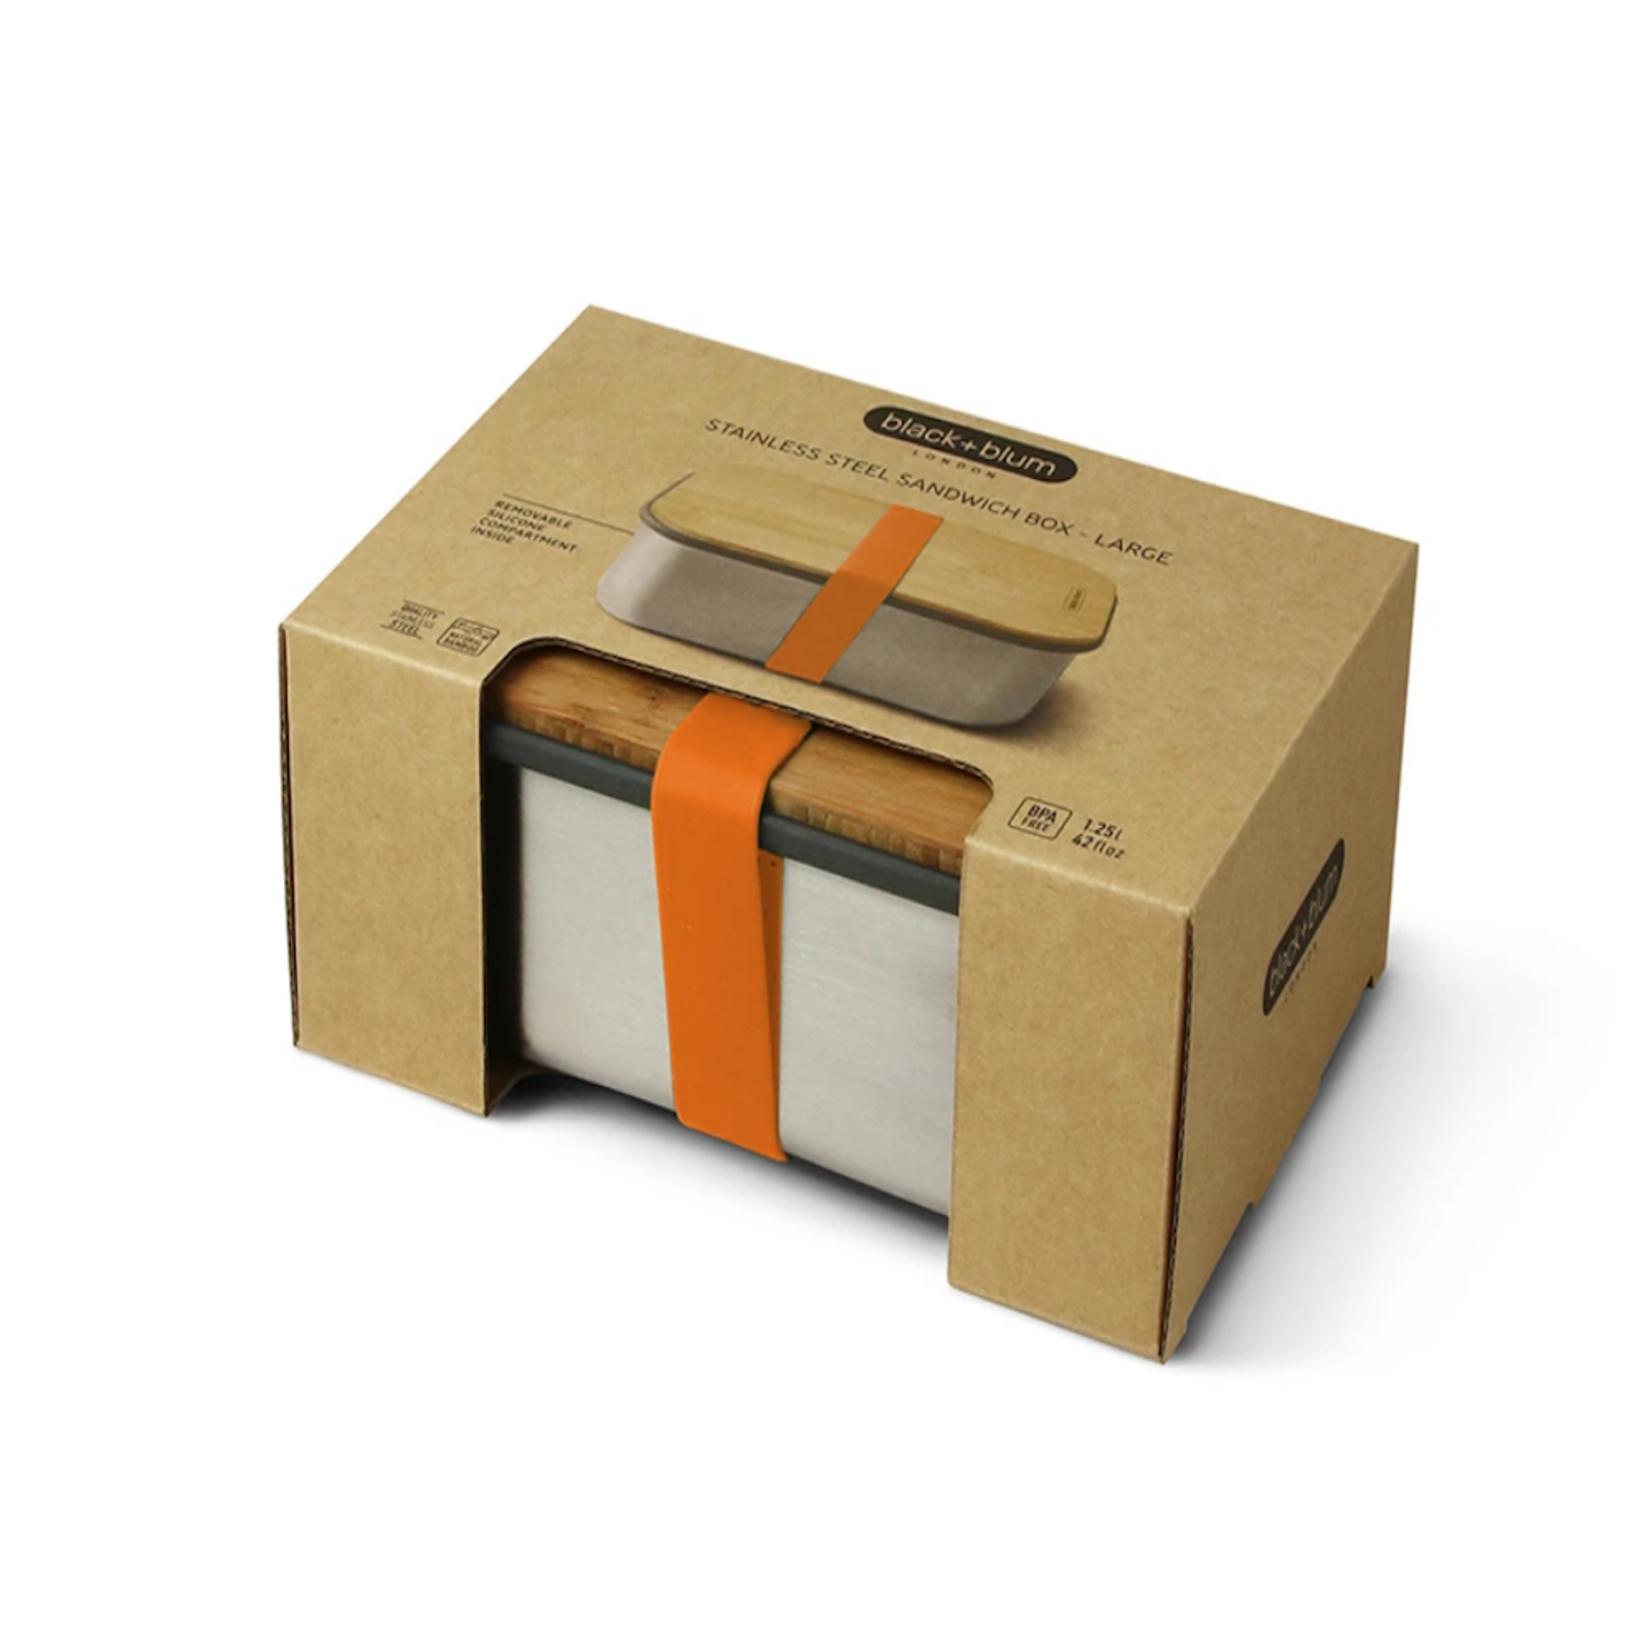 Black+Blum BLACK + BLUM Stainless steel & bamboo sandwich box - 1.25L